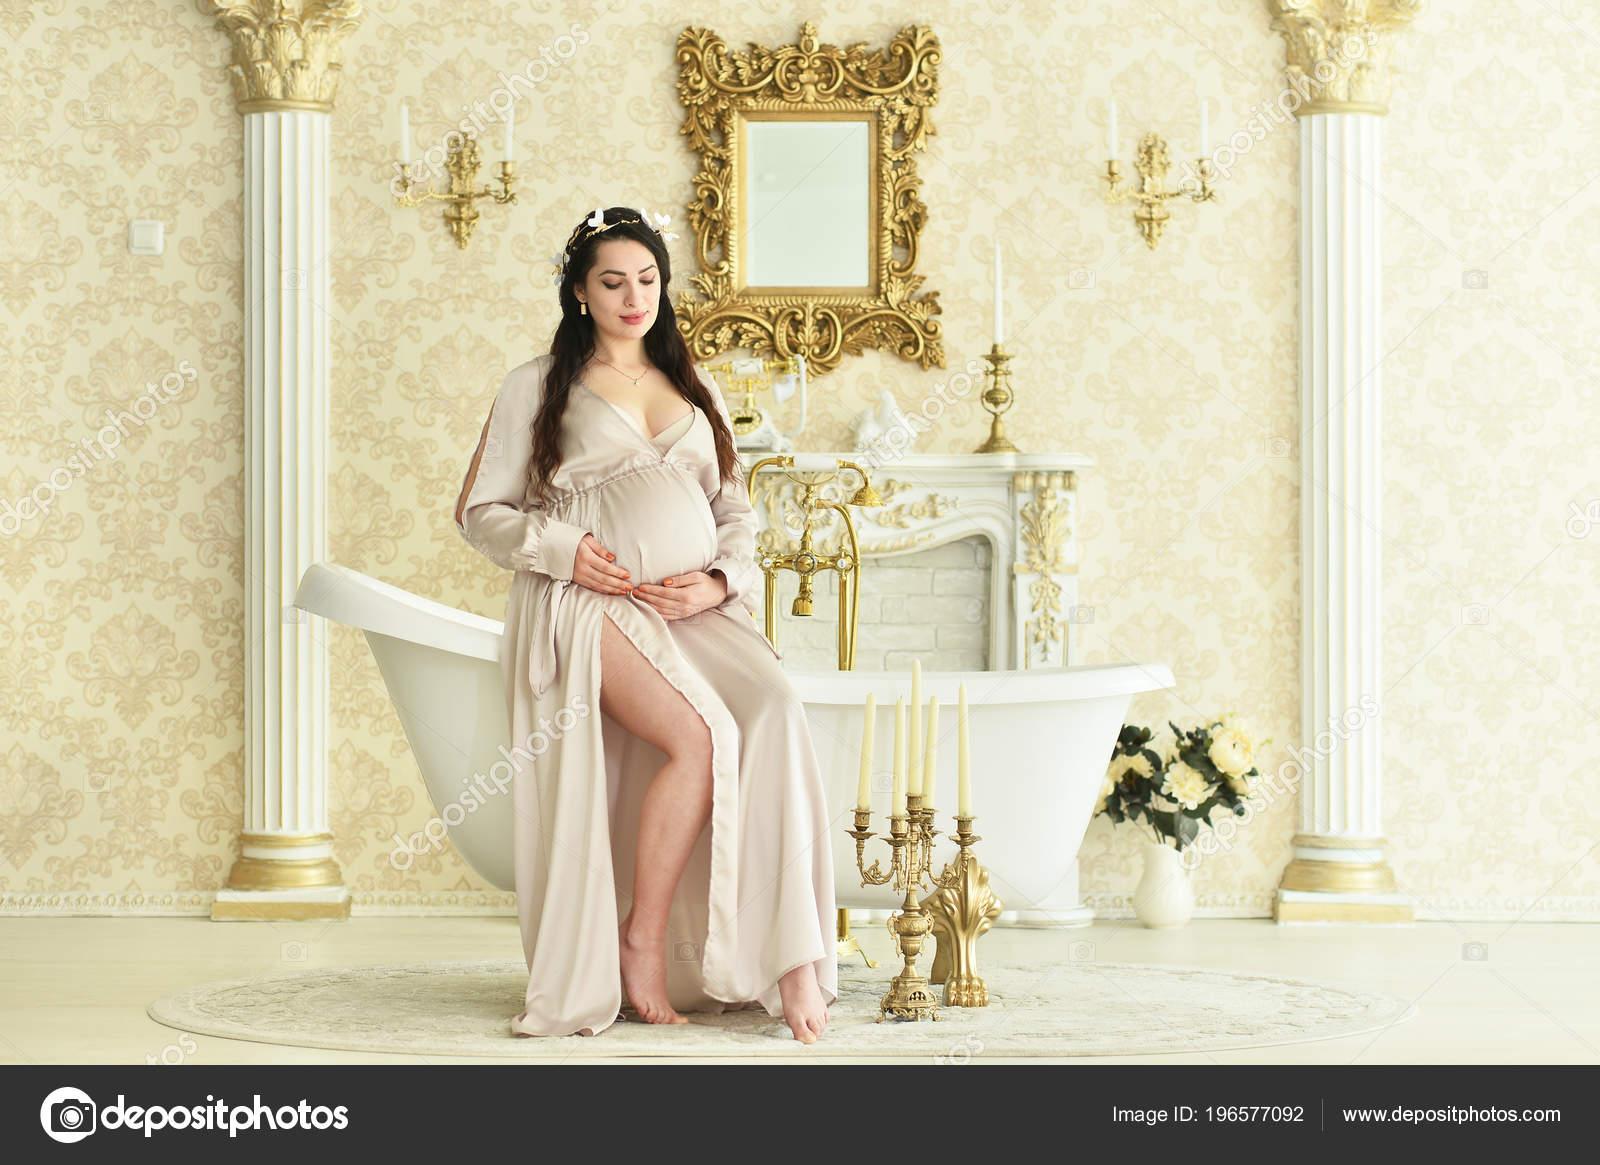 Vasca Da Bagno Gravidanza : Bella donna incinta che posa vasca bagno u2014 foto stock © aletia